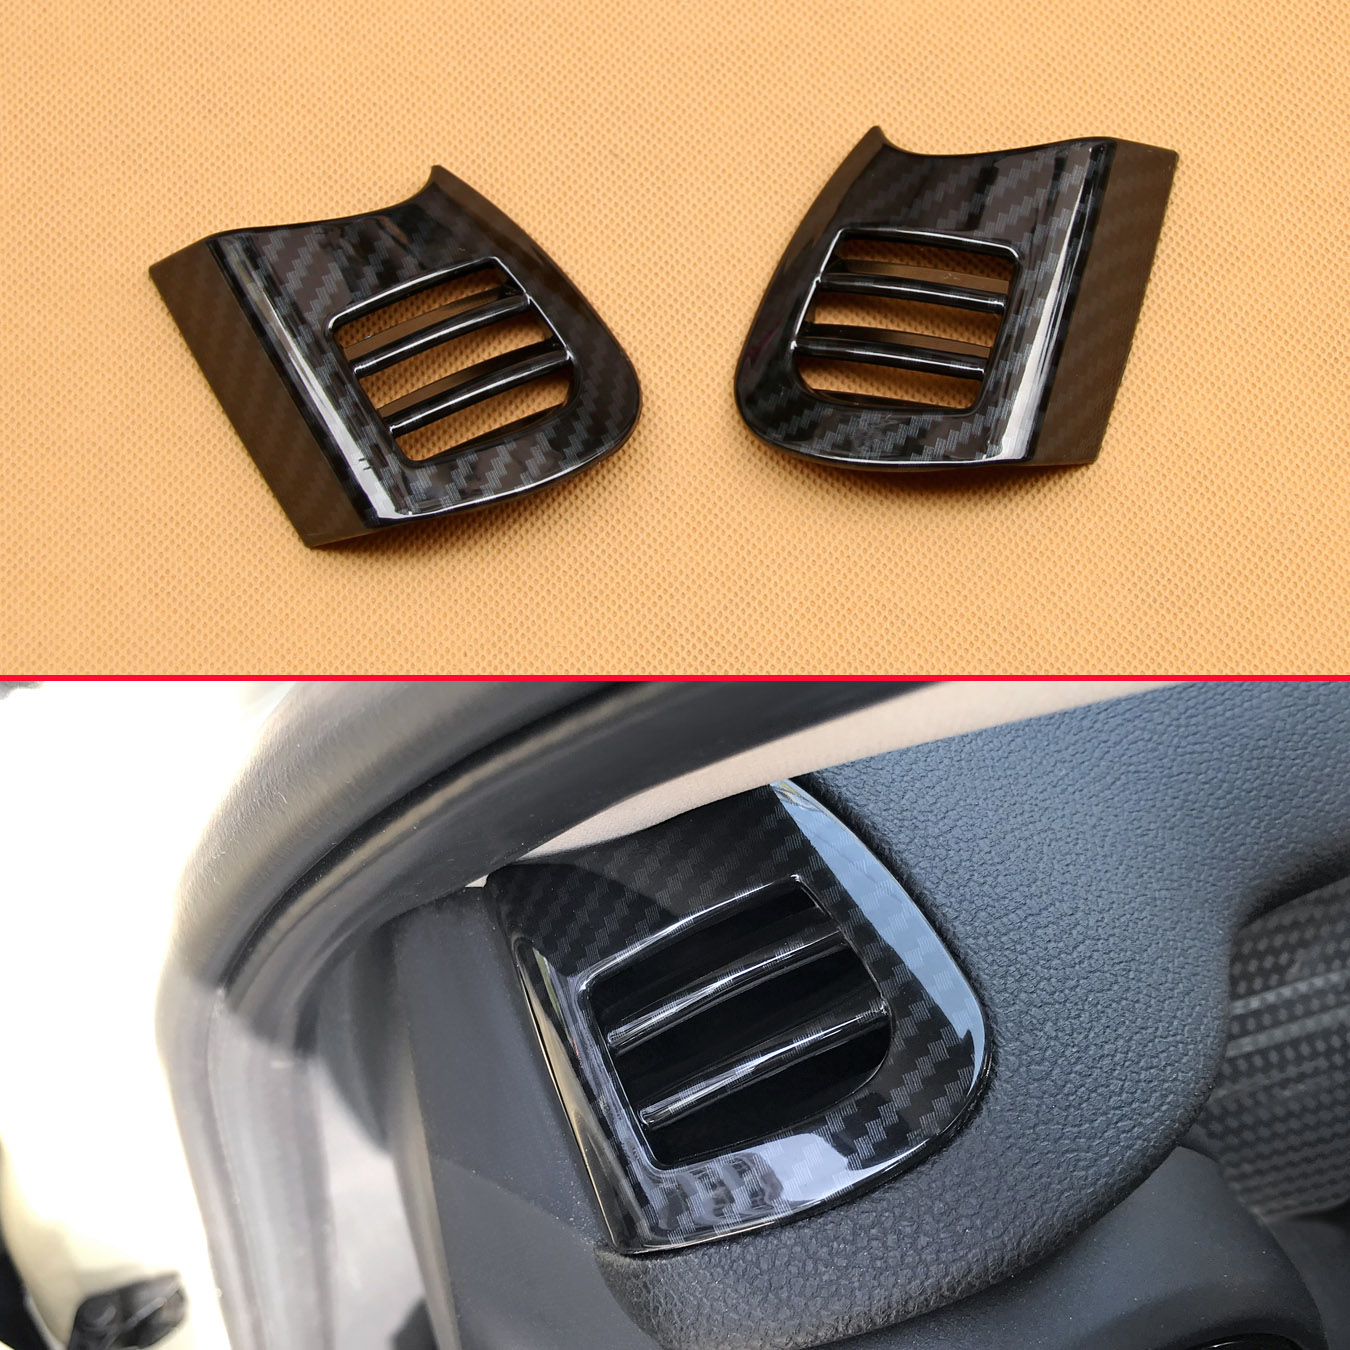 goede kopen dash air vent cover voor mini cooper f55 f56 f57 2015 2018 interieur dashboard trims accessoires goedkoop